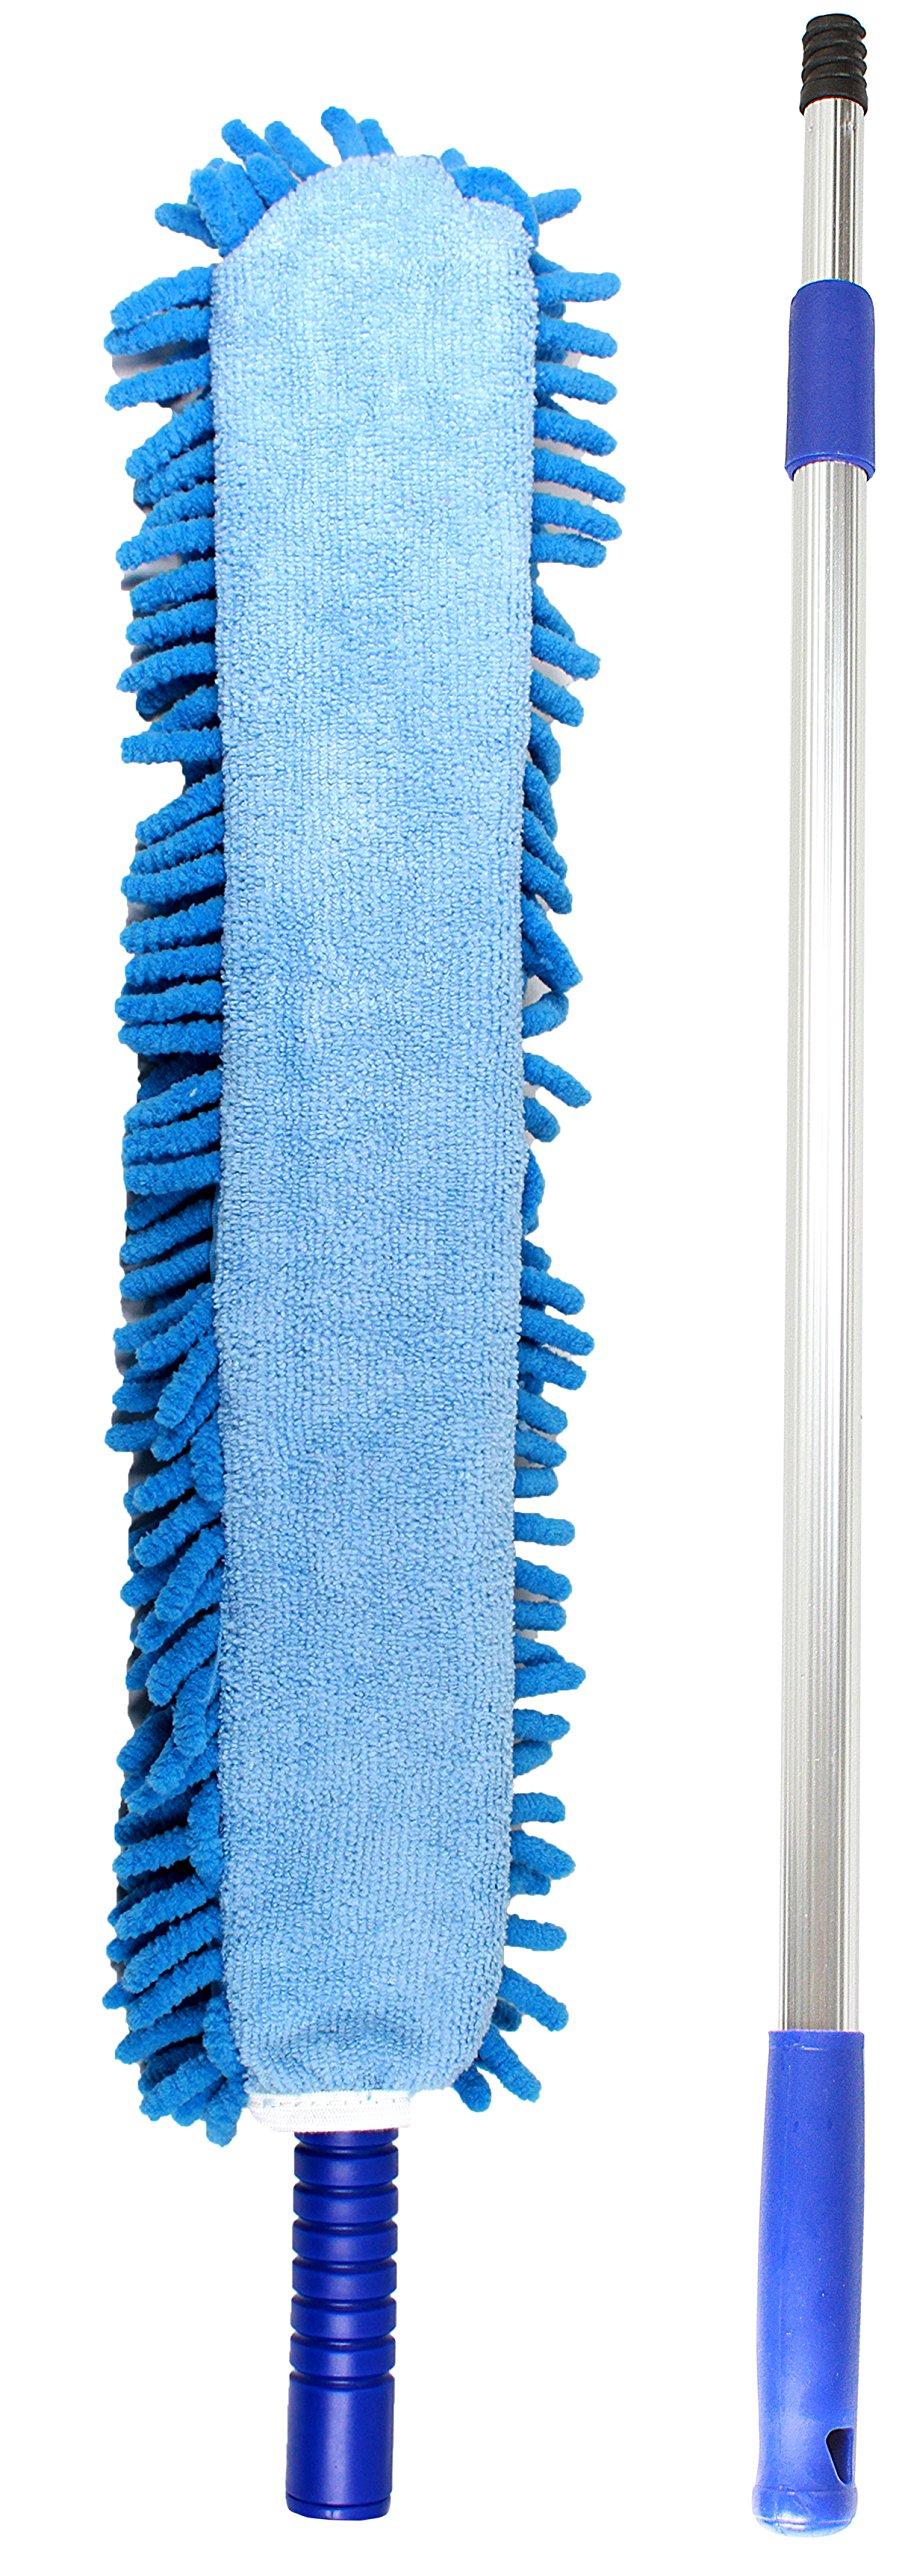 Jet Clean Chenille Microfiber Flat Hand Duster-Dust Appliances, Ceiling Fans, Blinds, Furniture, Shutters, Cars, Delicate Surfaces-Chenille-Extension Pole Reach 25-44'' by Jet Clean